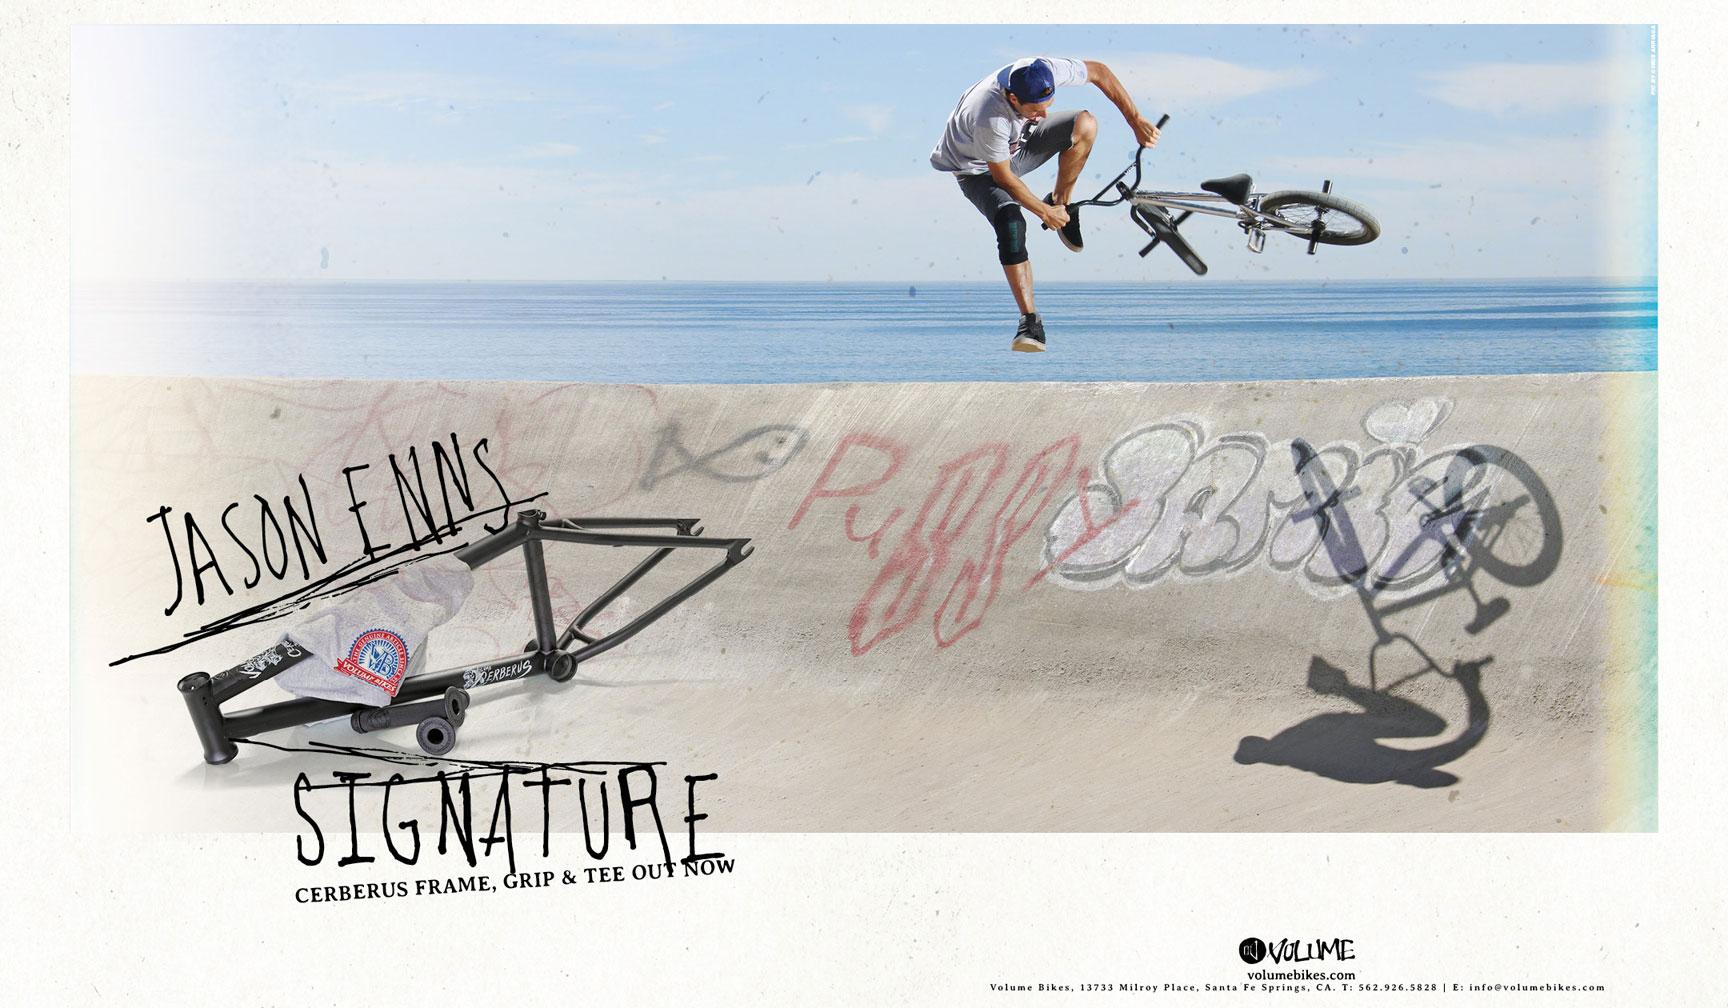 Enns' signature parts ad